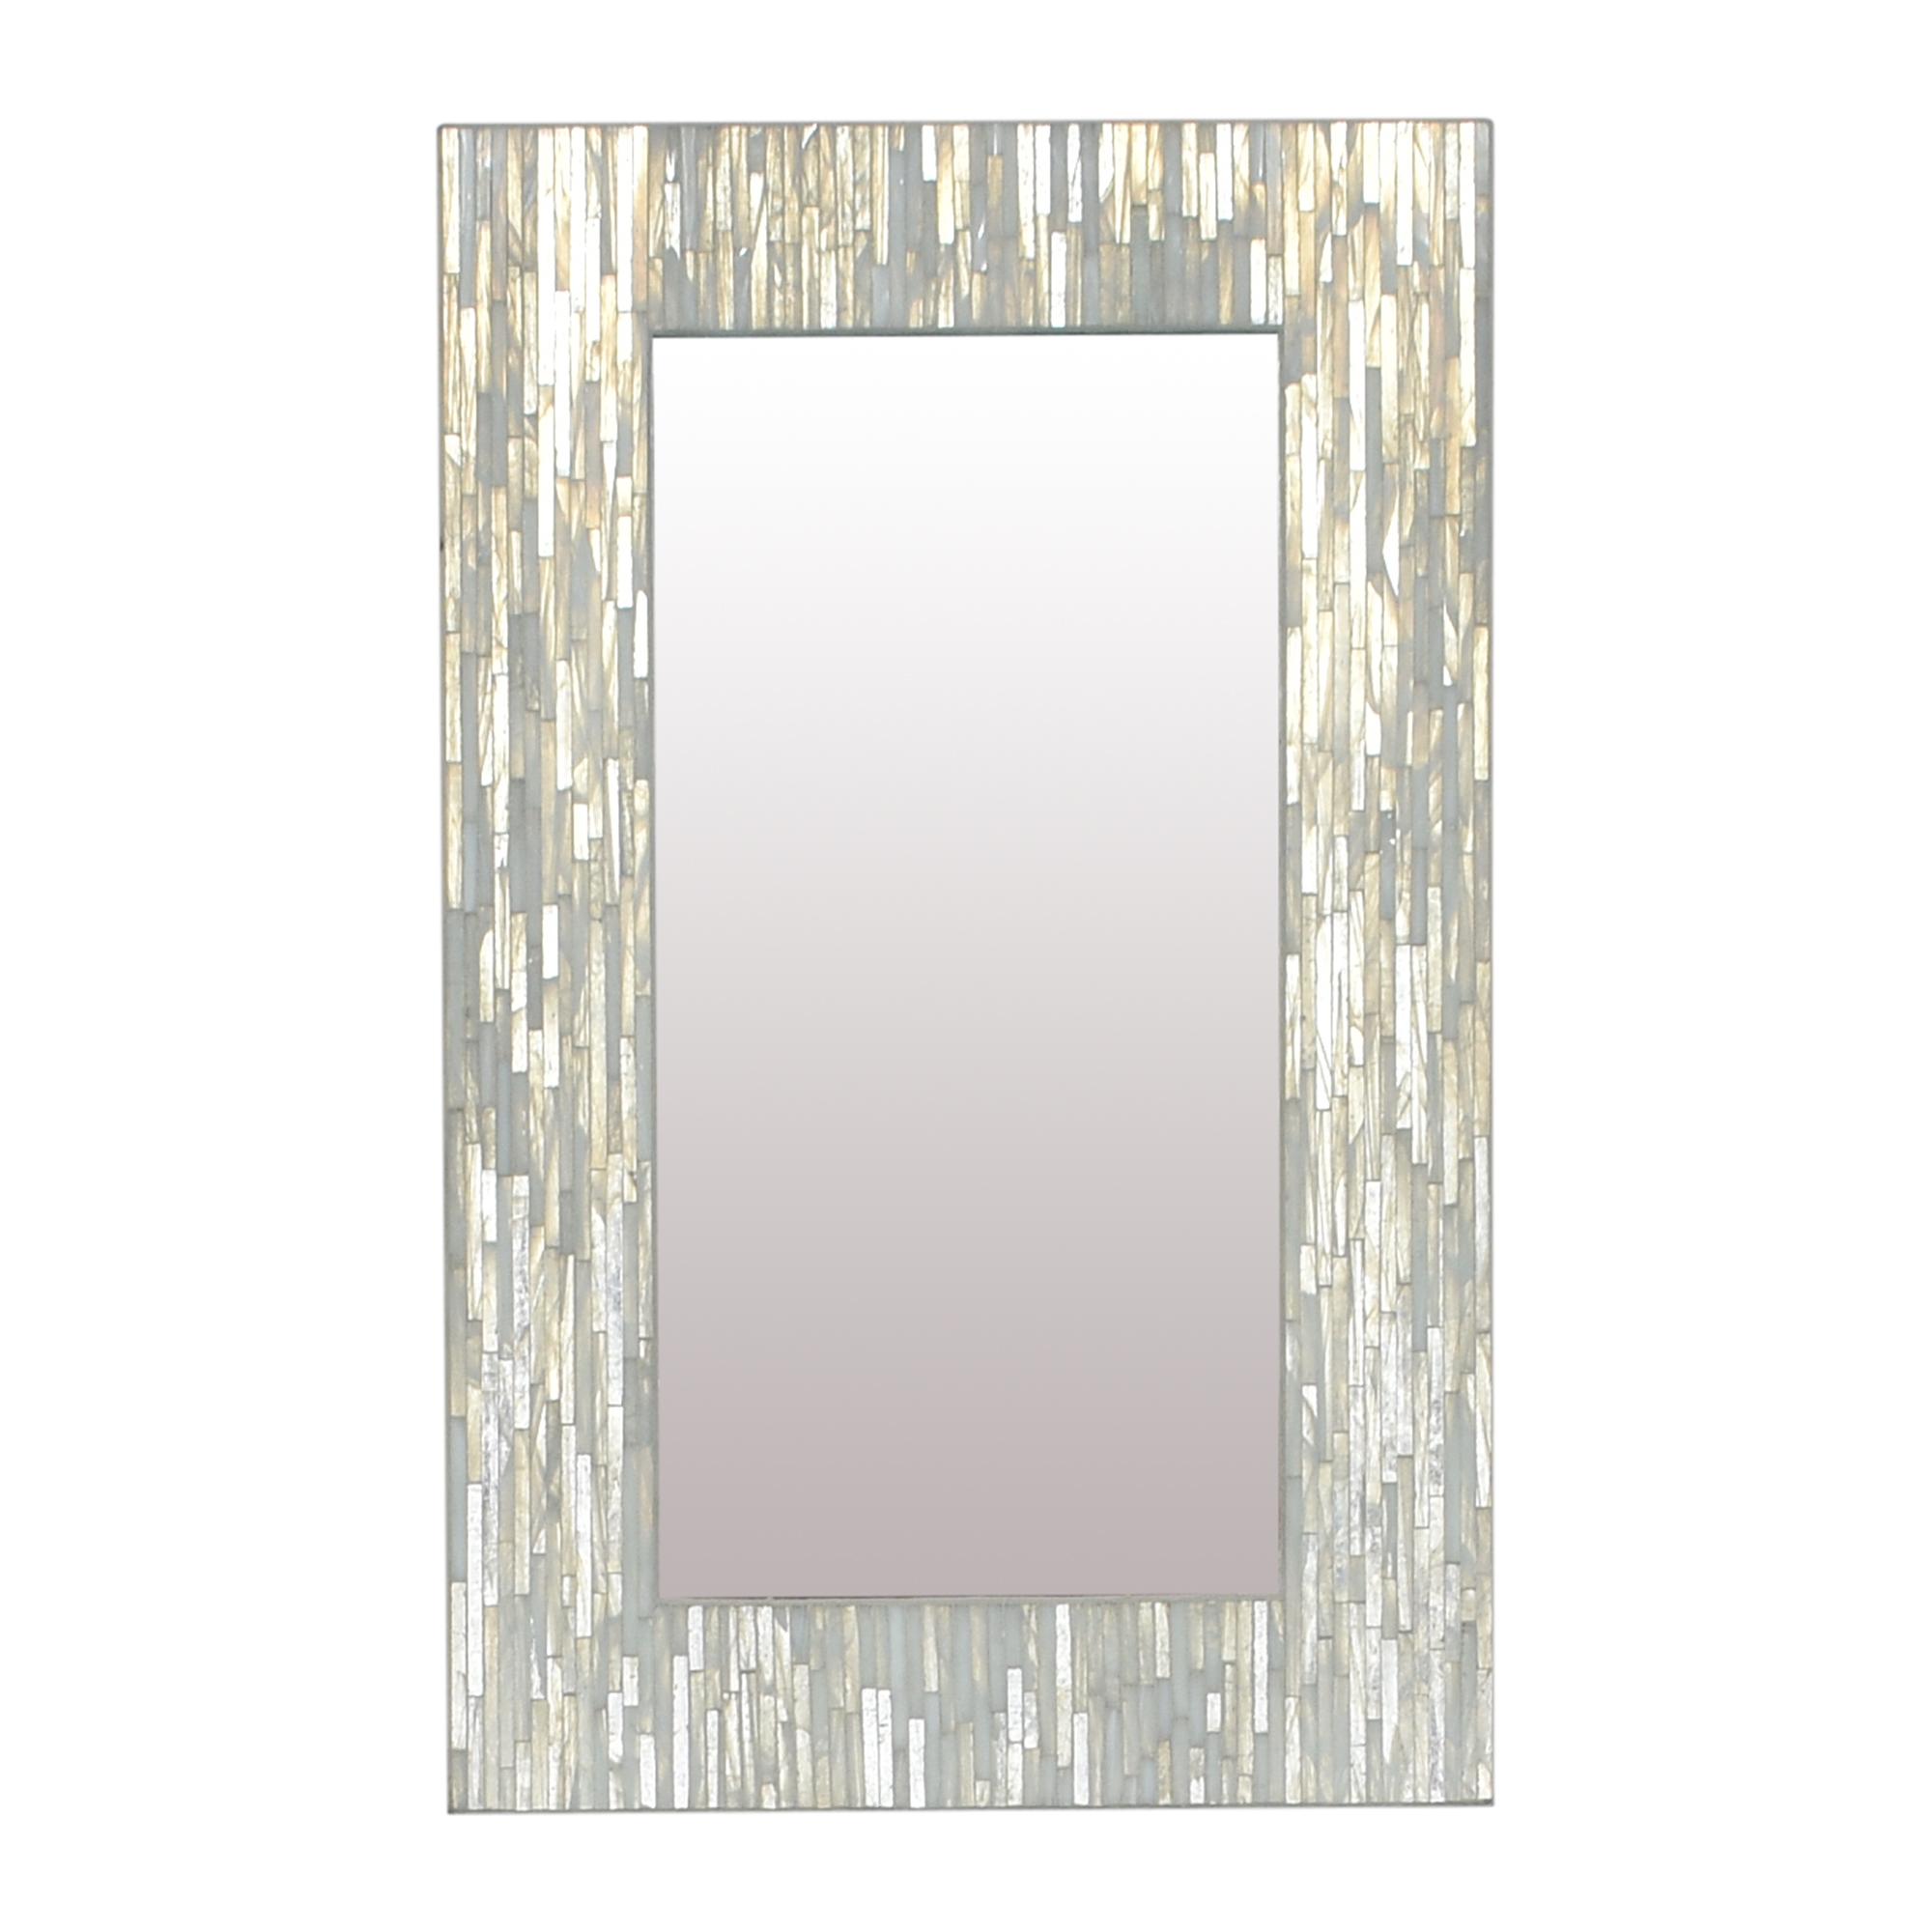 Lillian August Lillian August Mosaic Mirror pa